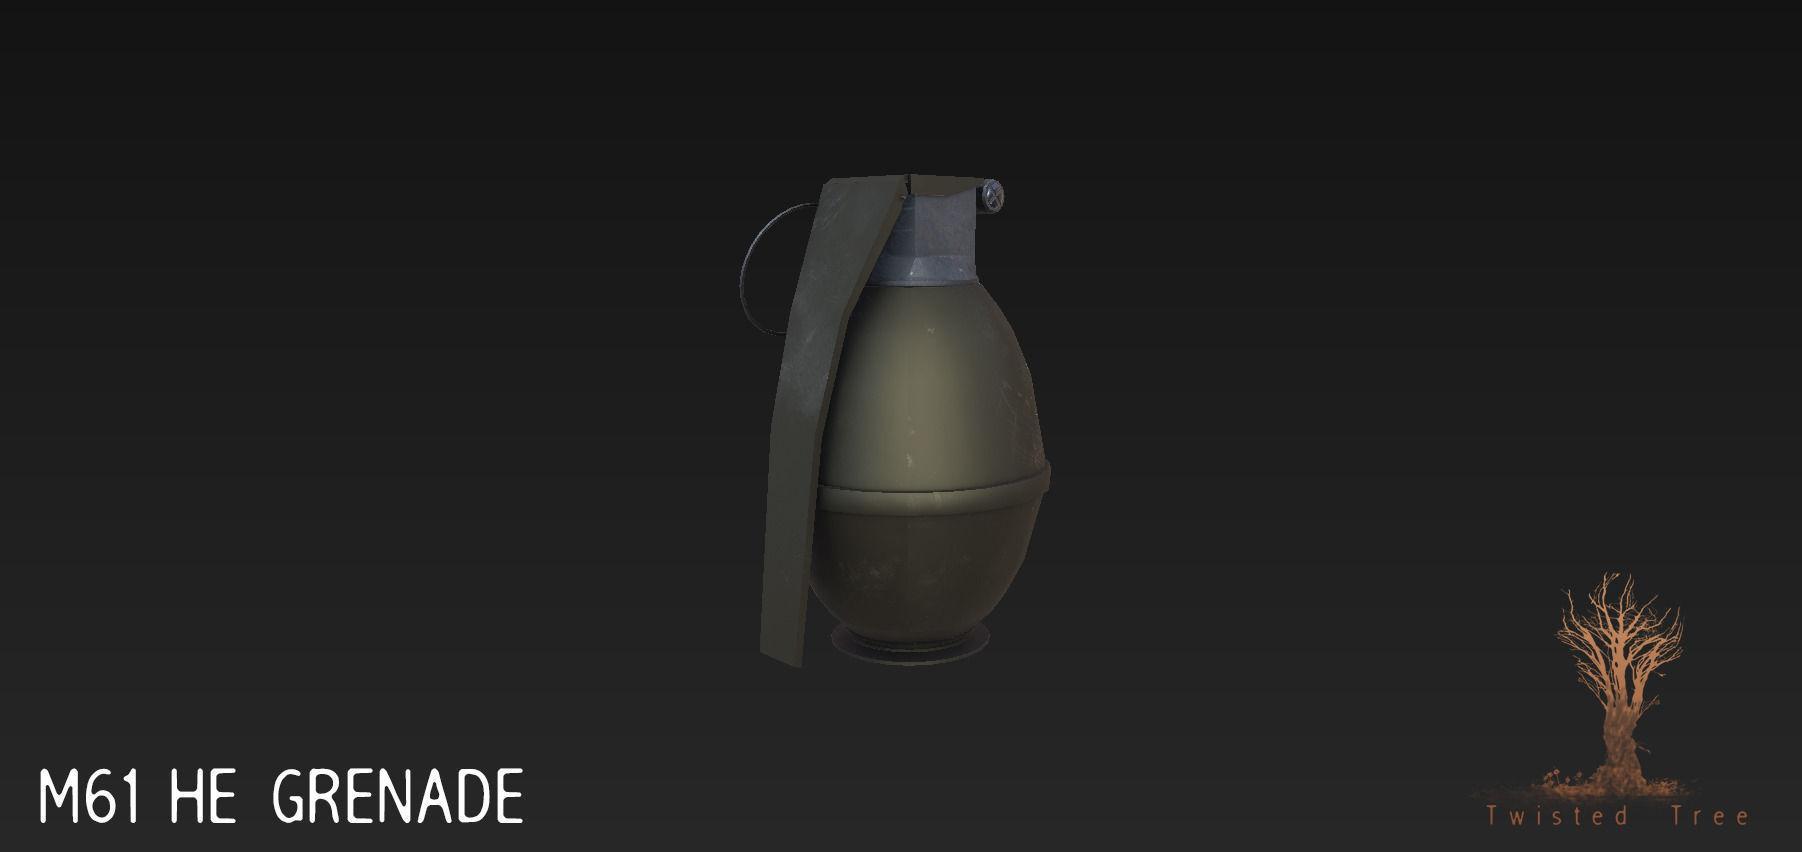 m61 grenade - photo #38